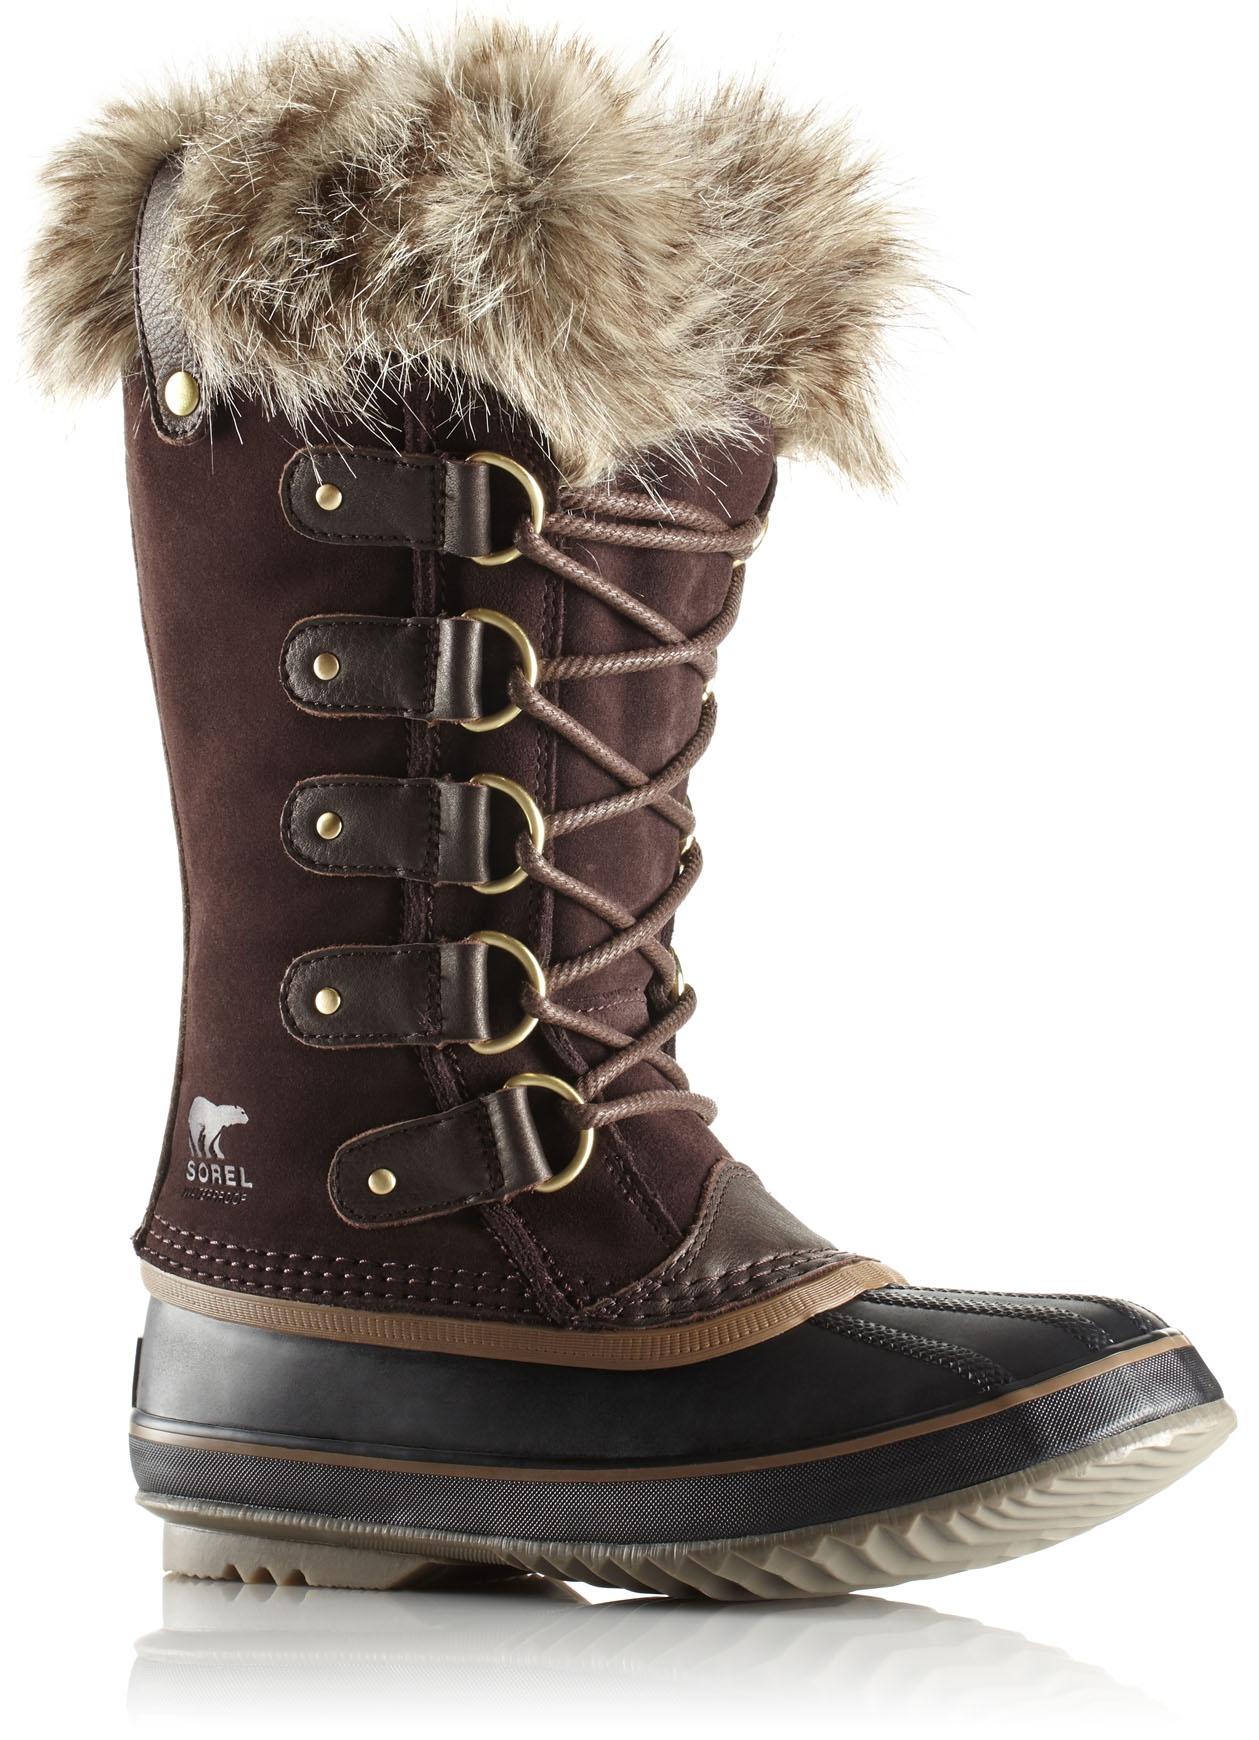 Of Sorel Arctic Femme Ski W Après Joan Snowleader Cattail 7TfnwqTZ